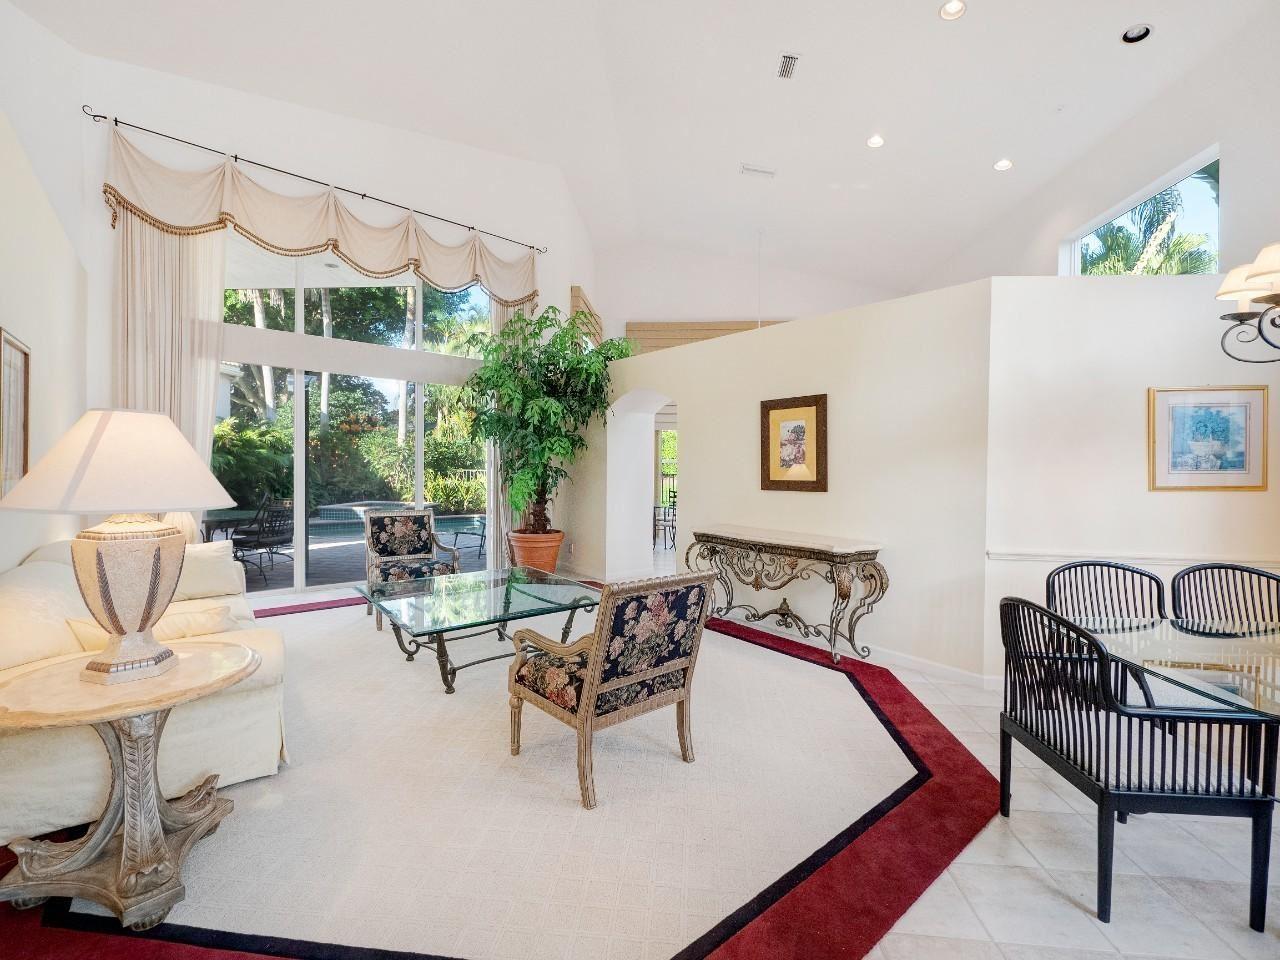 Photo of 324 Sunset Bay Lane, Palm Beach Gardens, FL 33418 (MLS # RX-10700694)